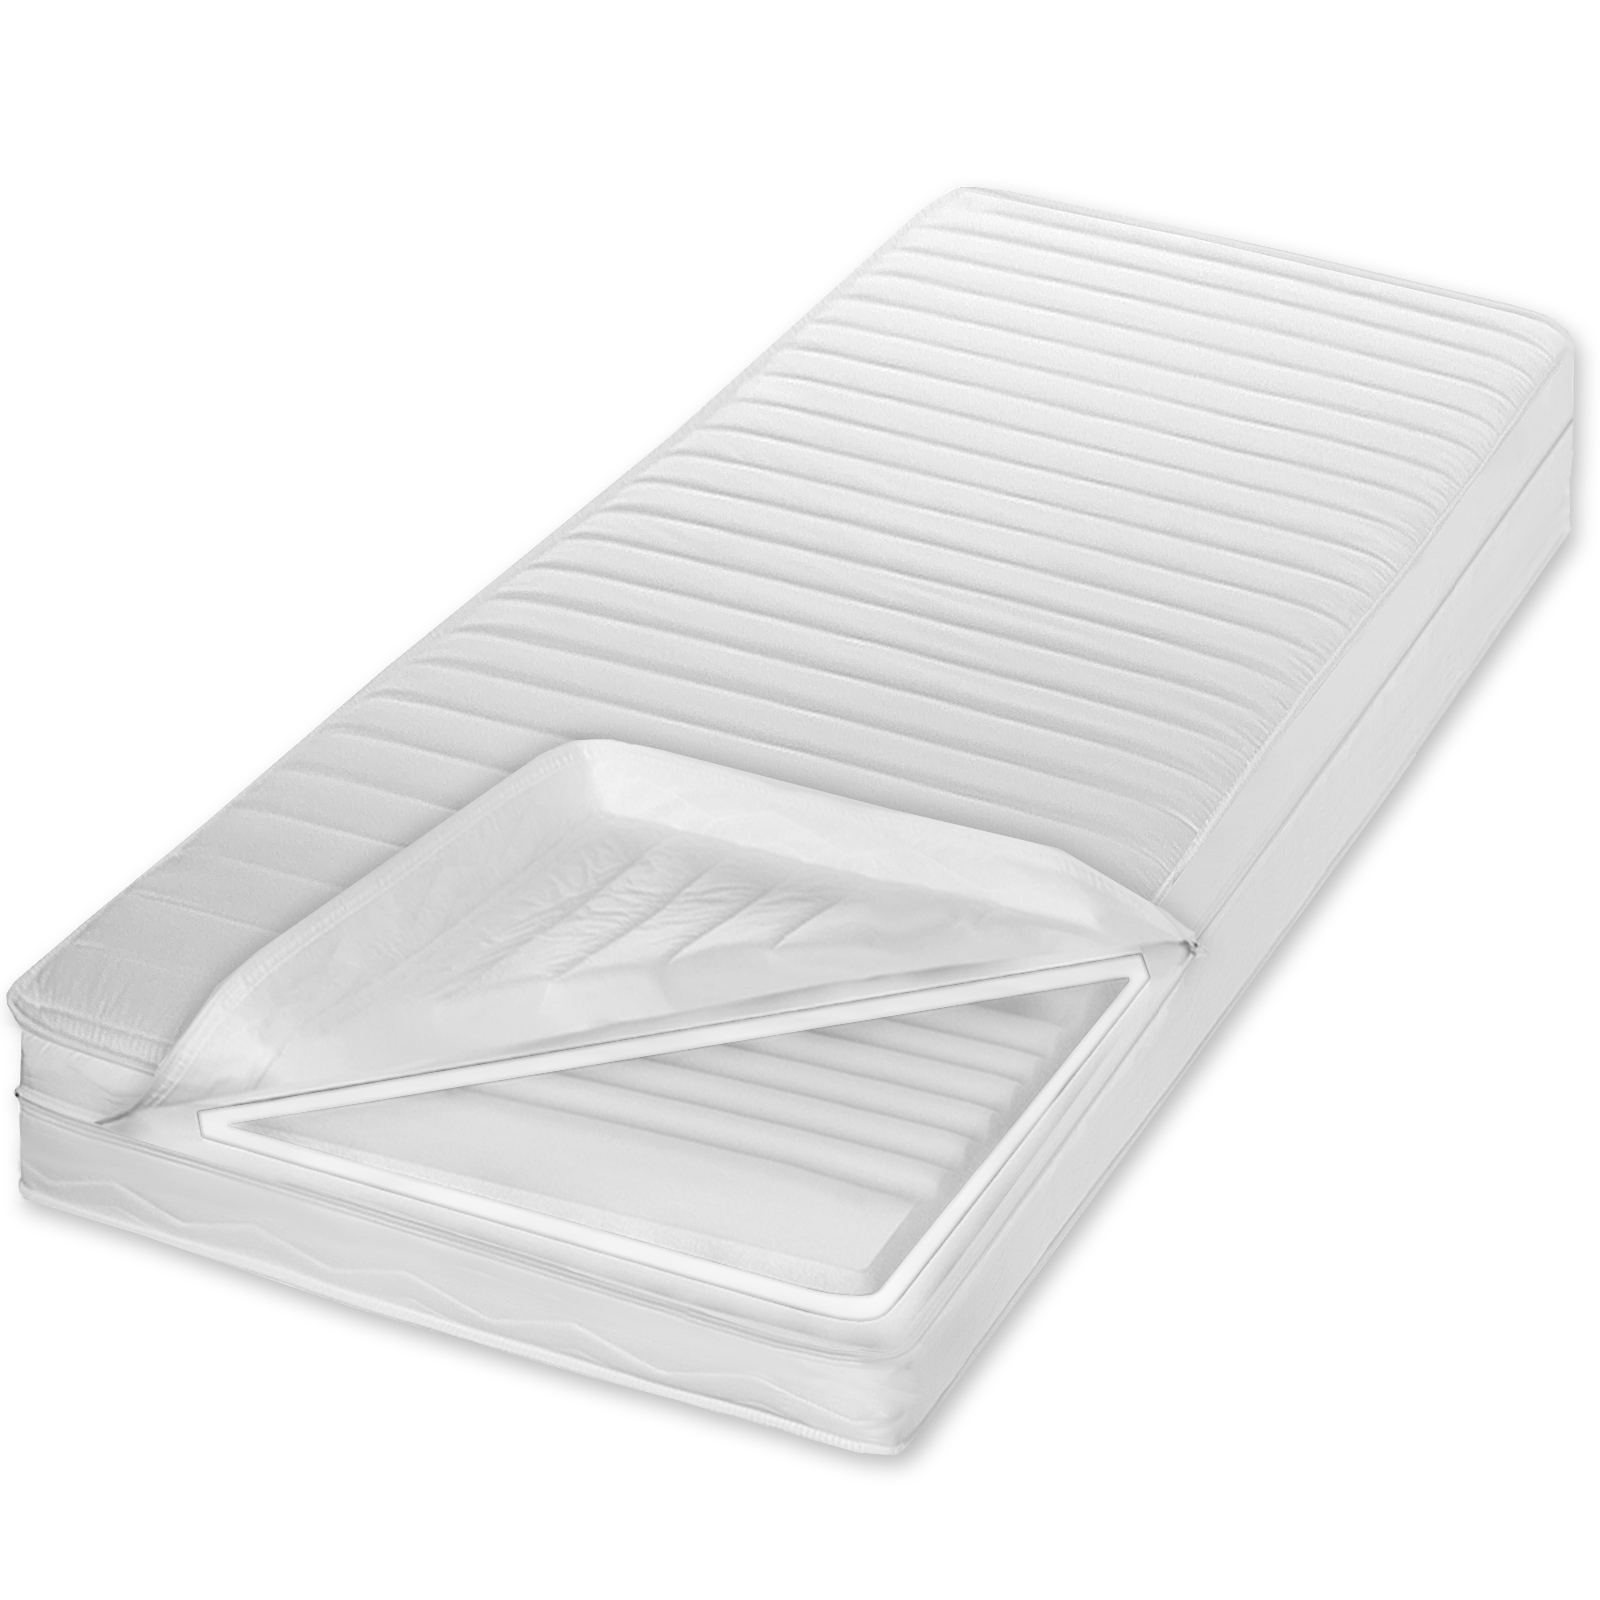 7 zonen aquaflex comfort plus marken kaltschaum. Black Bedroom Furniture Sets. Home Design Ideas